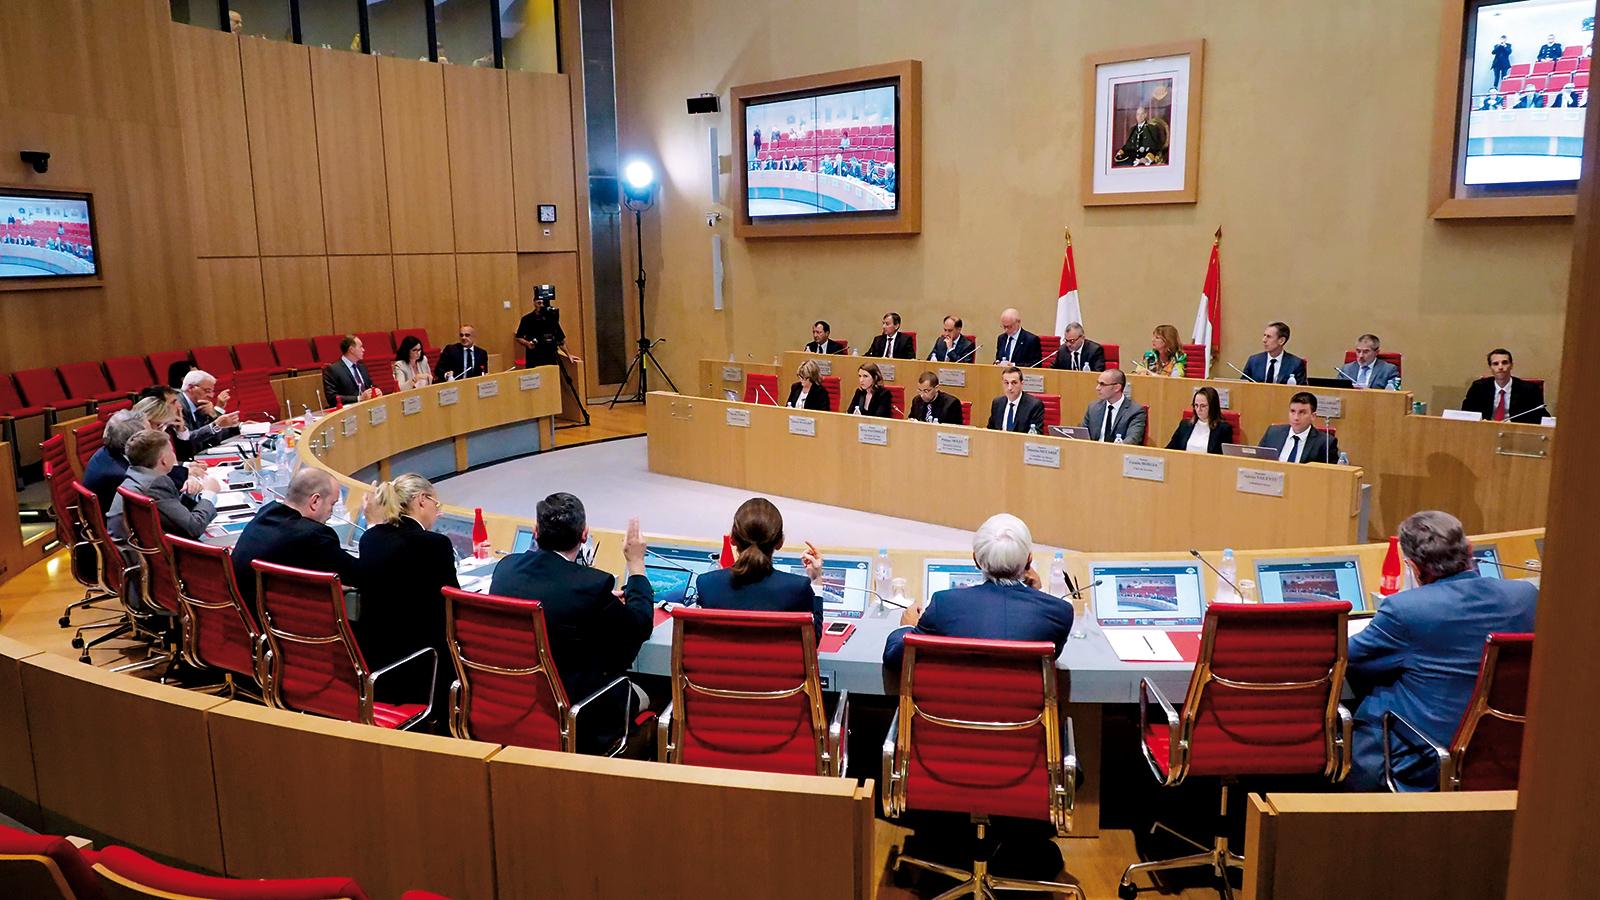 Conseil-national-seance-du-28-juin-2017-@-Conseil-national-P6281992